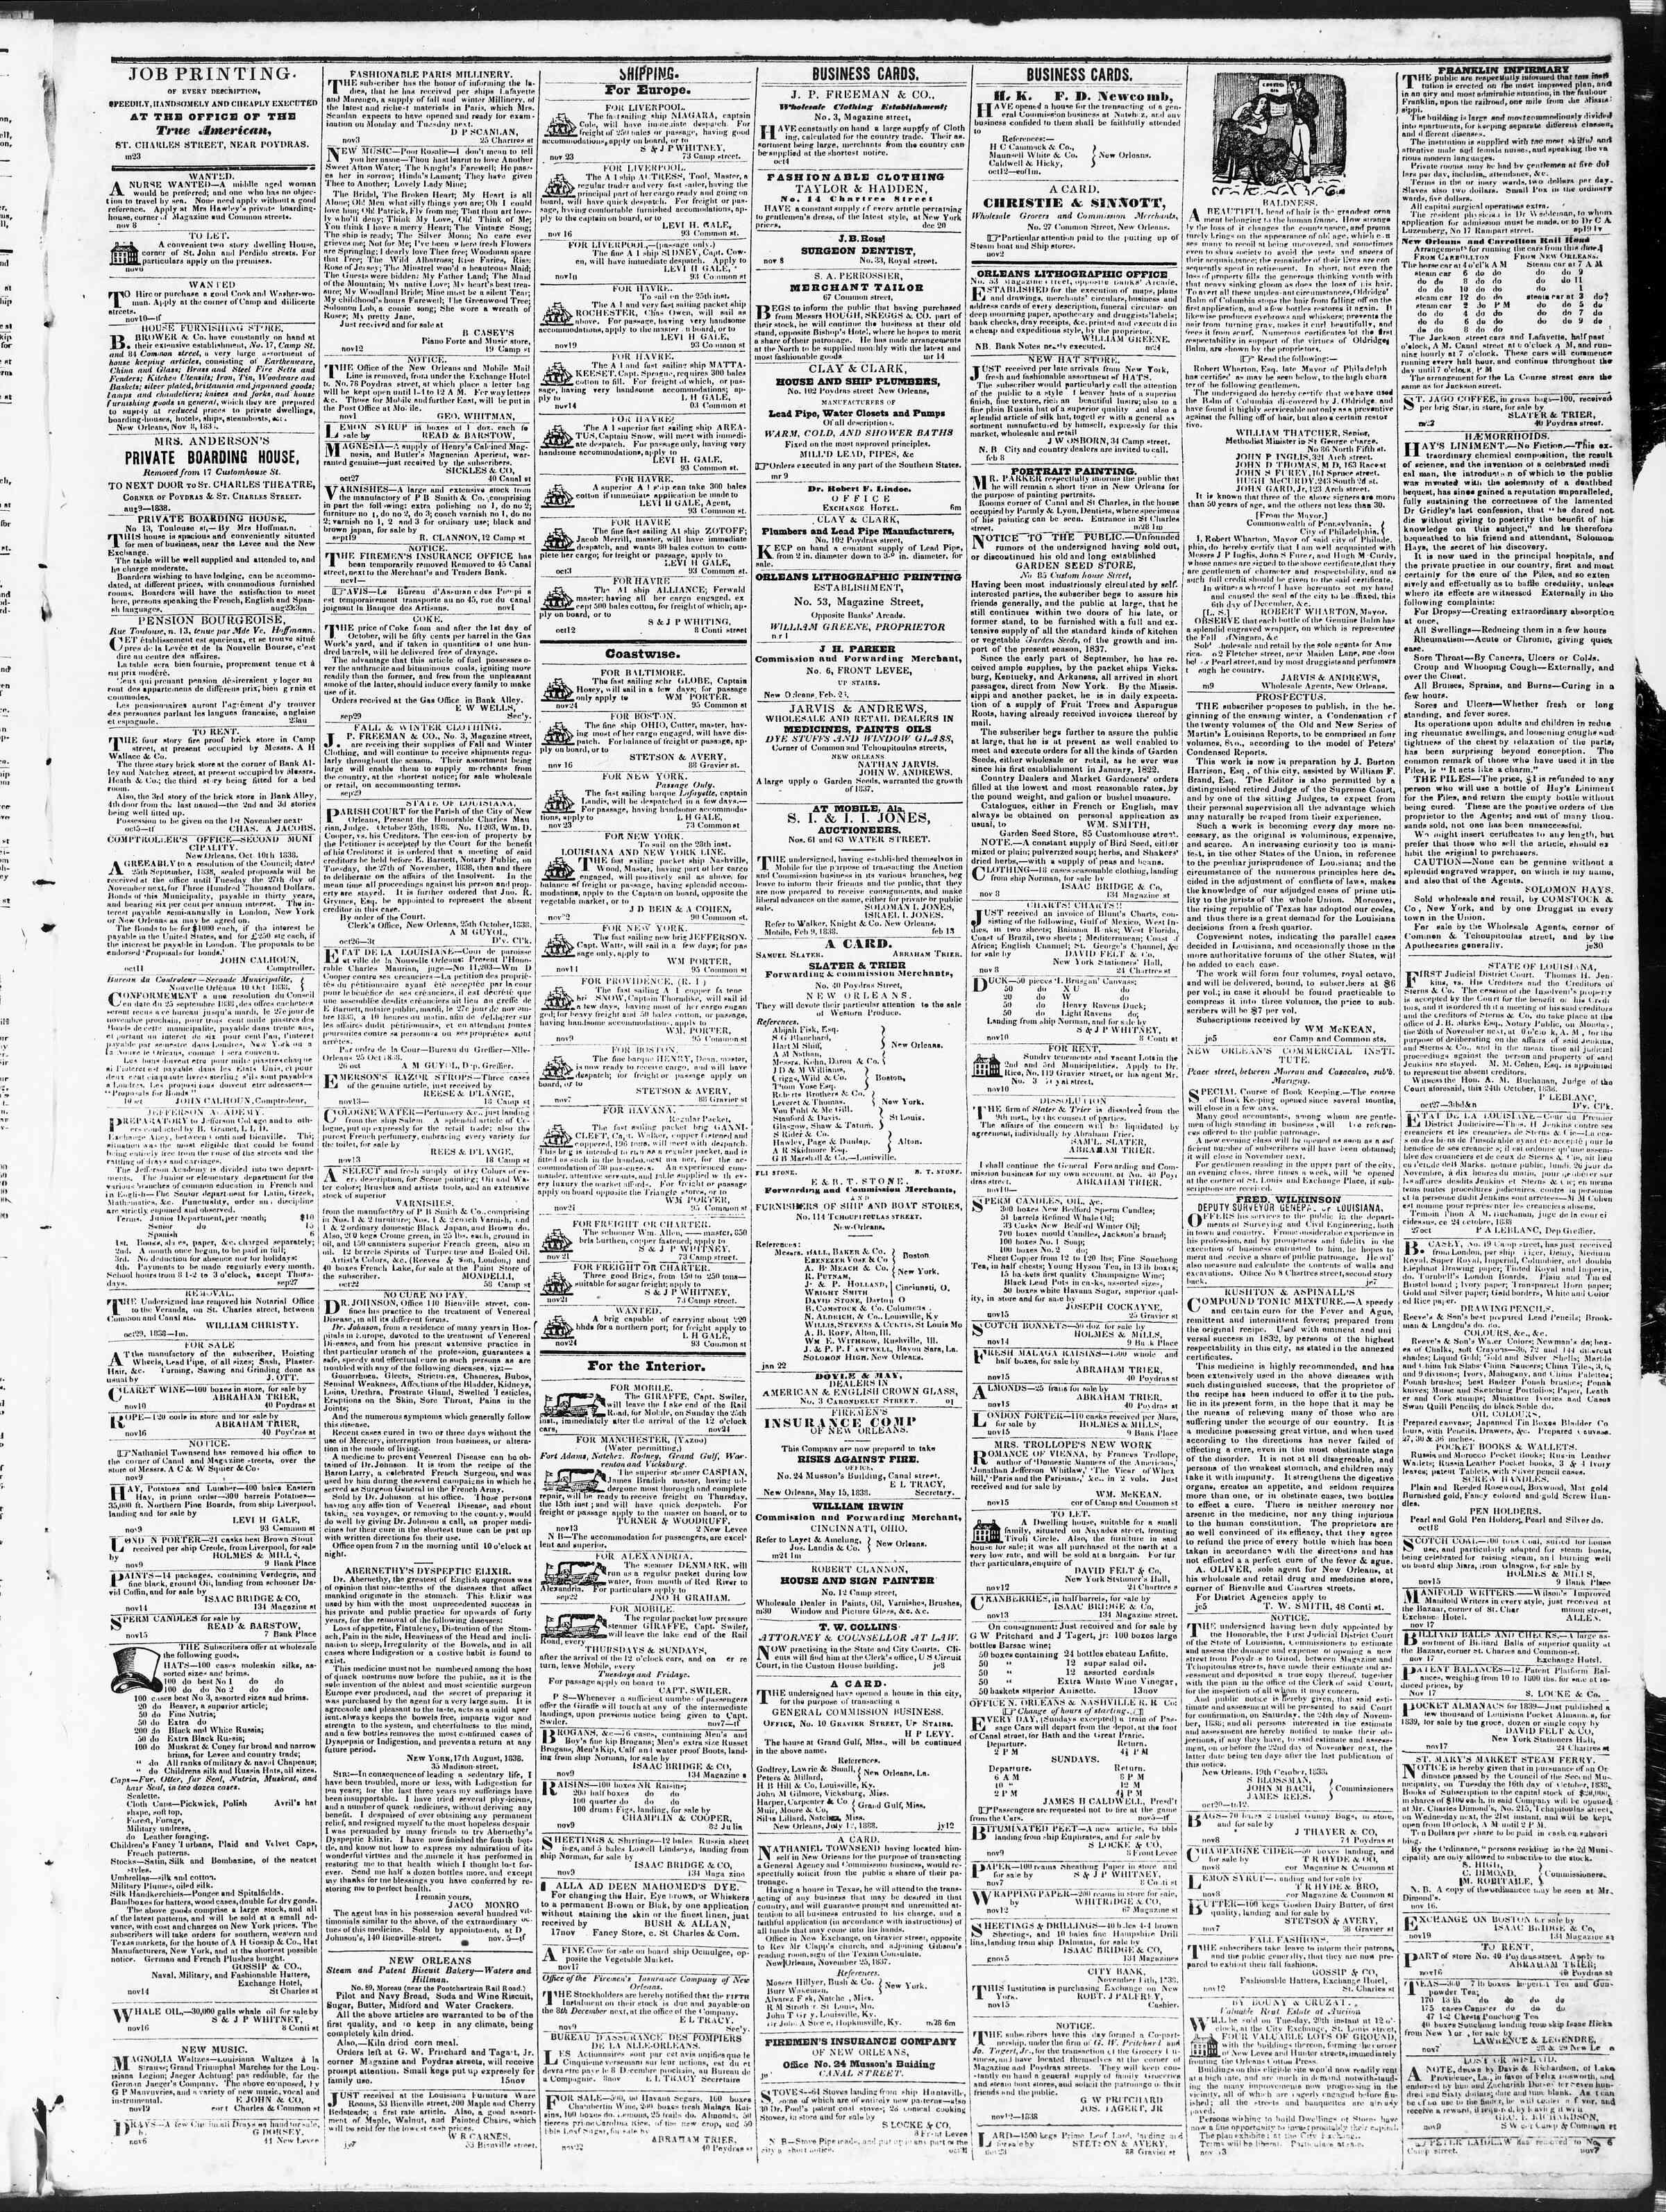 November 26, 1838 Tarihli True American Gazetesi Sayfa 3